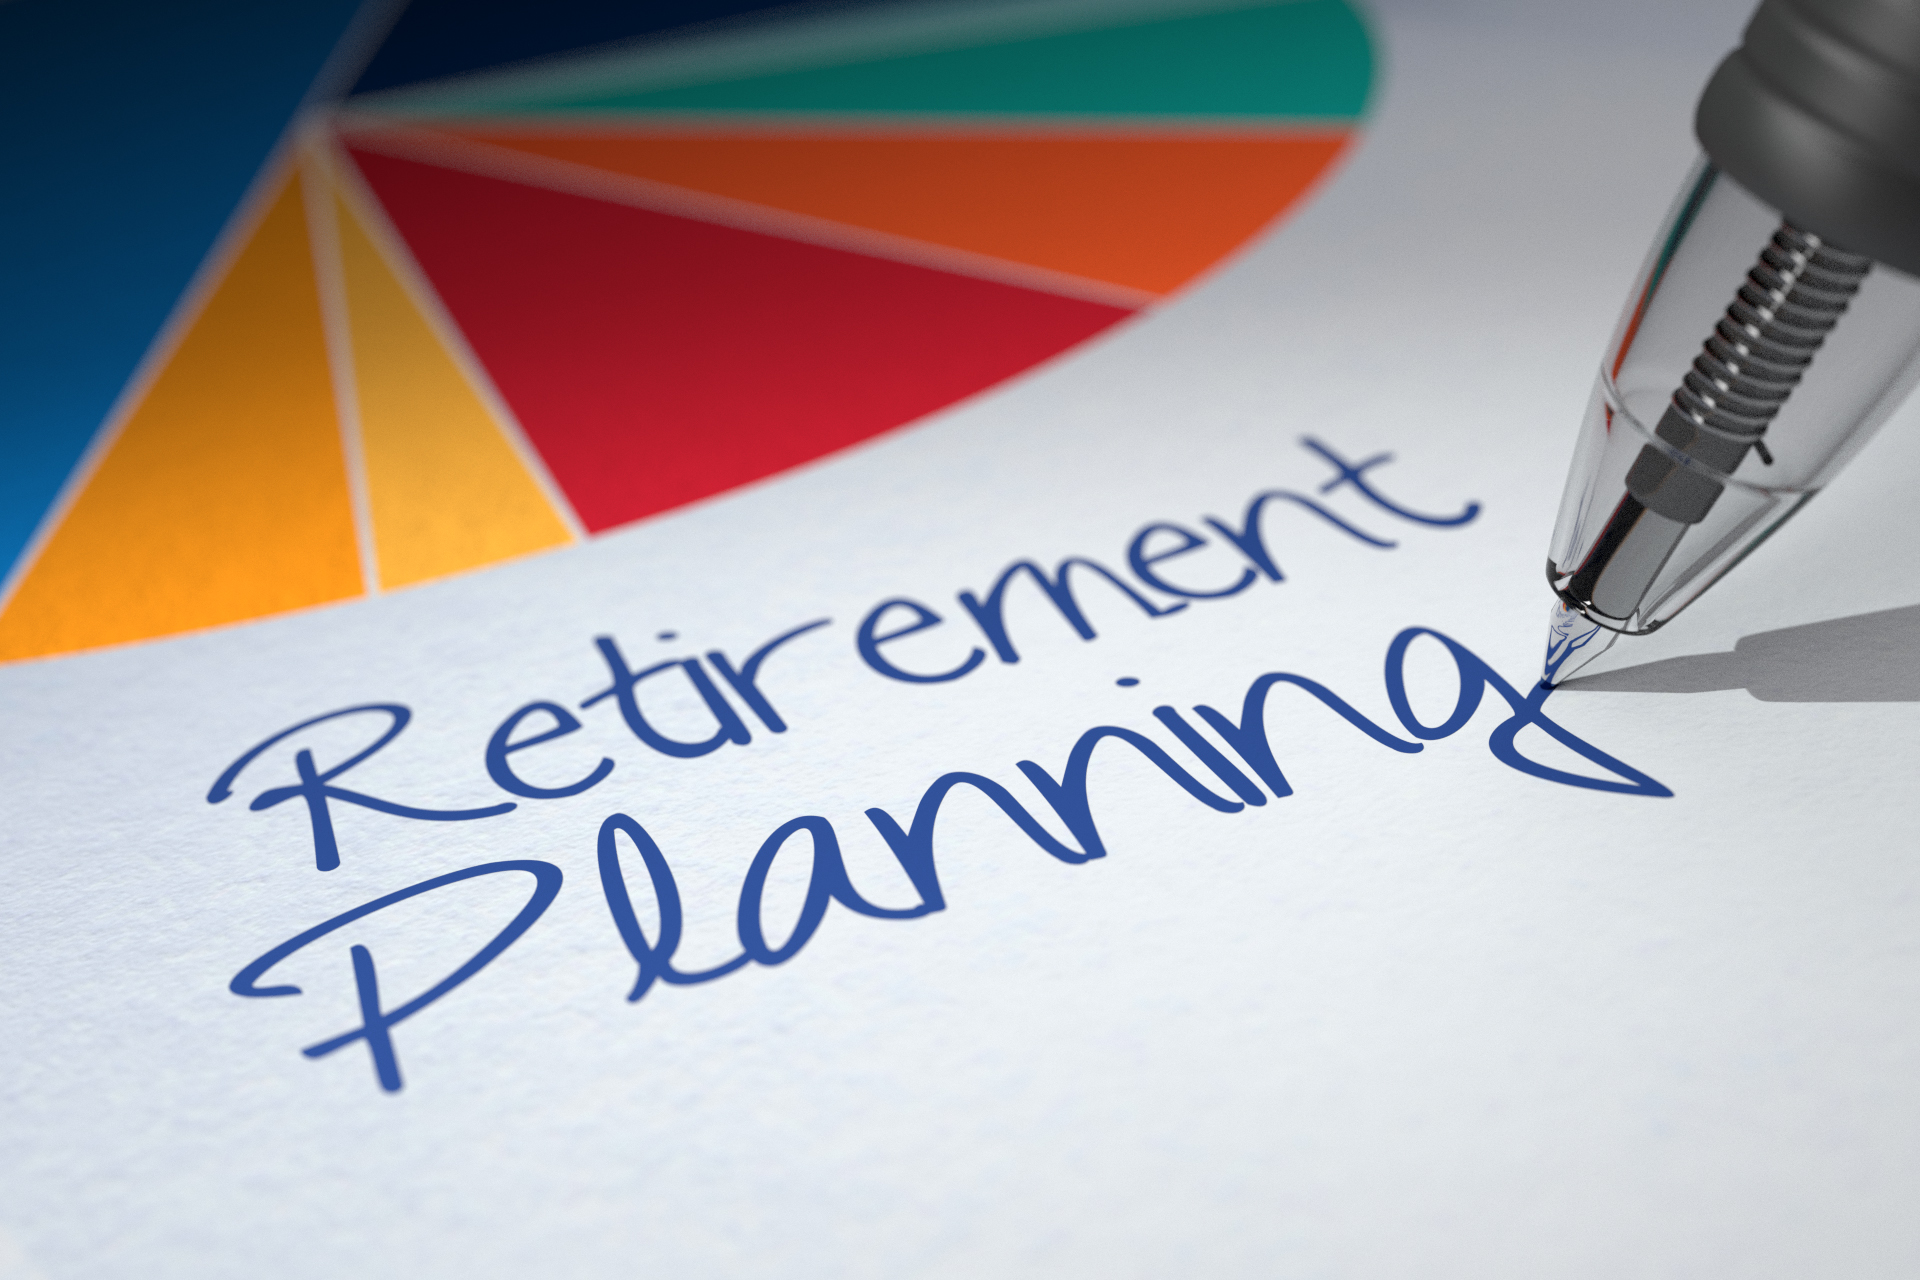 Retirement Planning script free image download